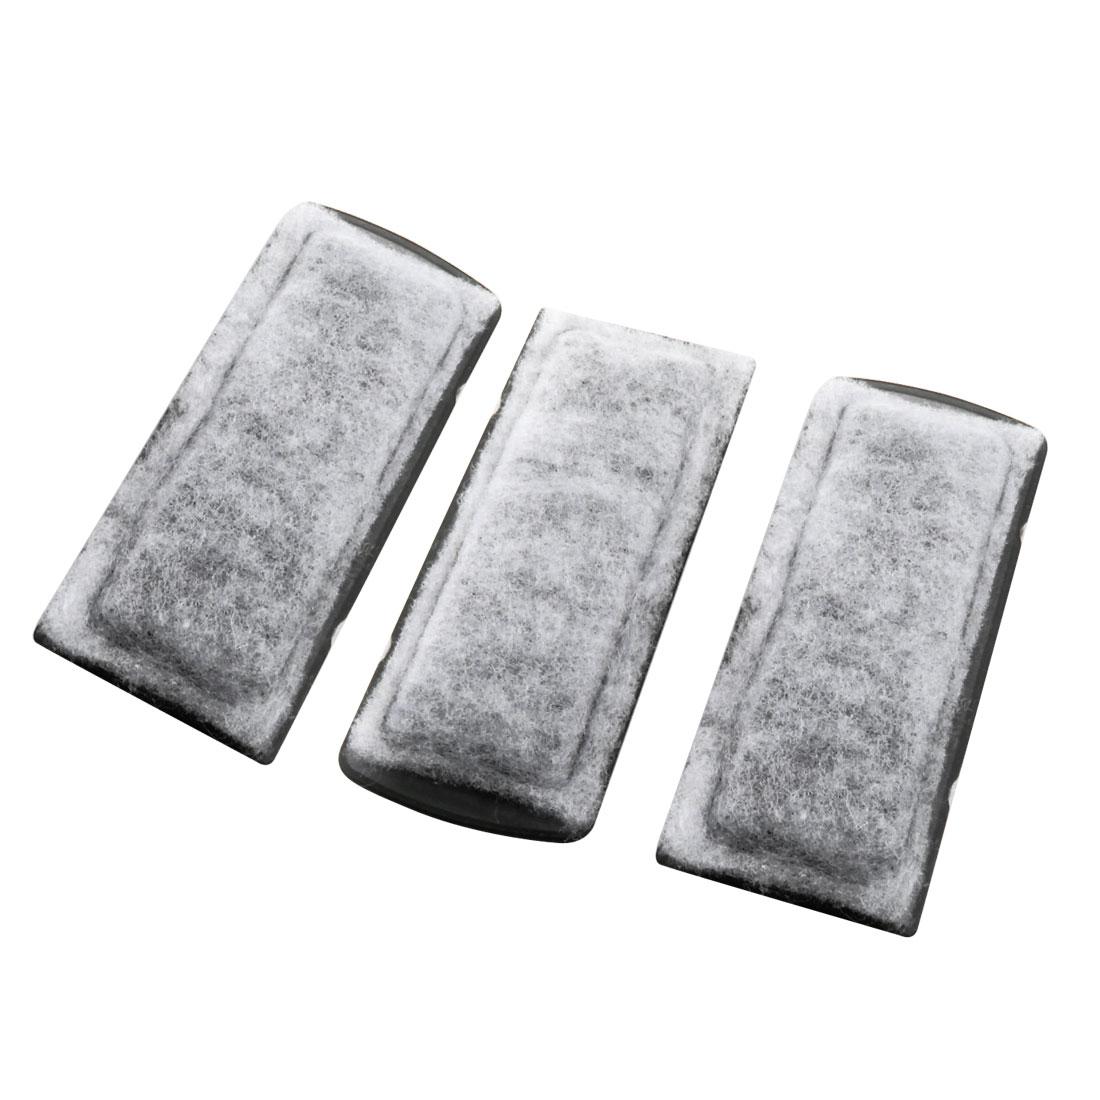 3 Pcs 13.5cm x 5cm x 1.3cm Rectangular Filter Sponge Pad Mat White for Fish Tank